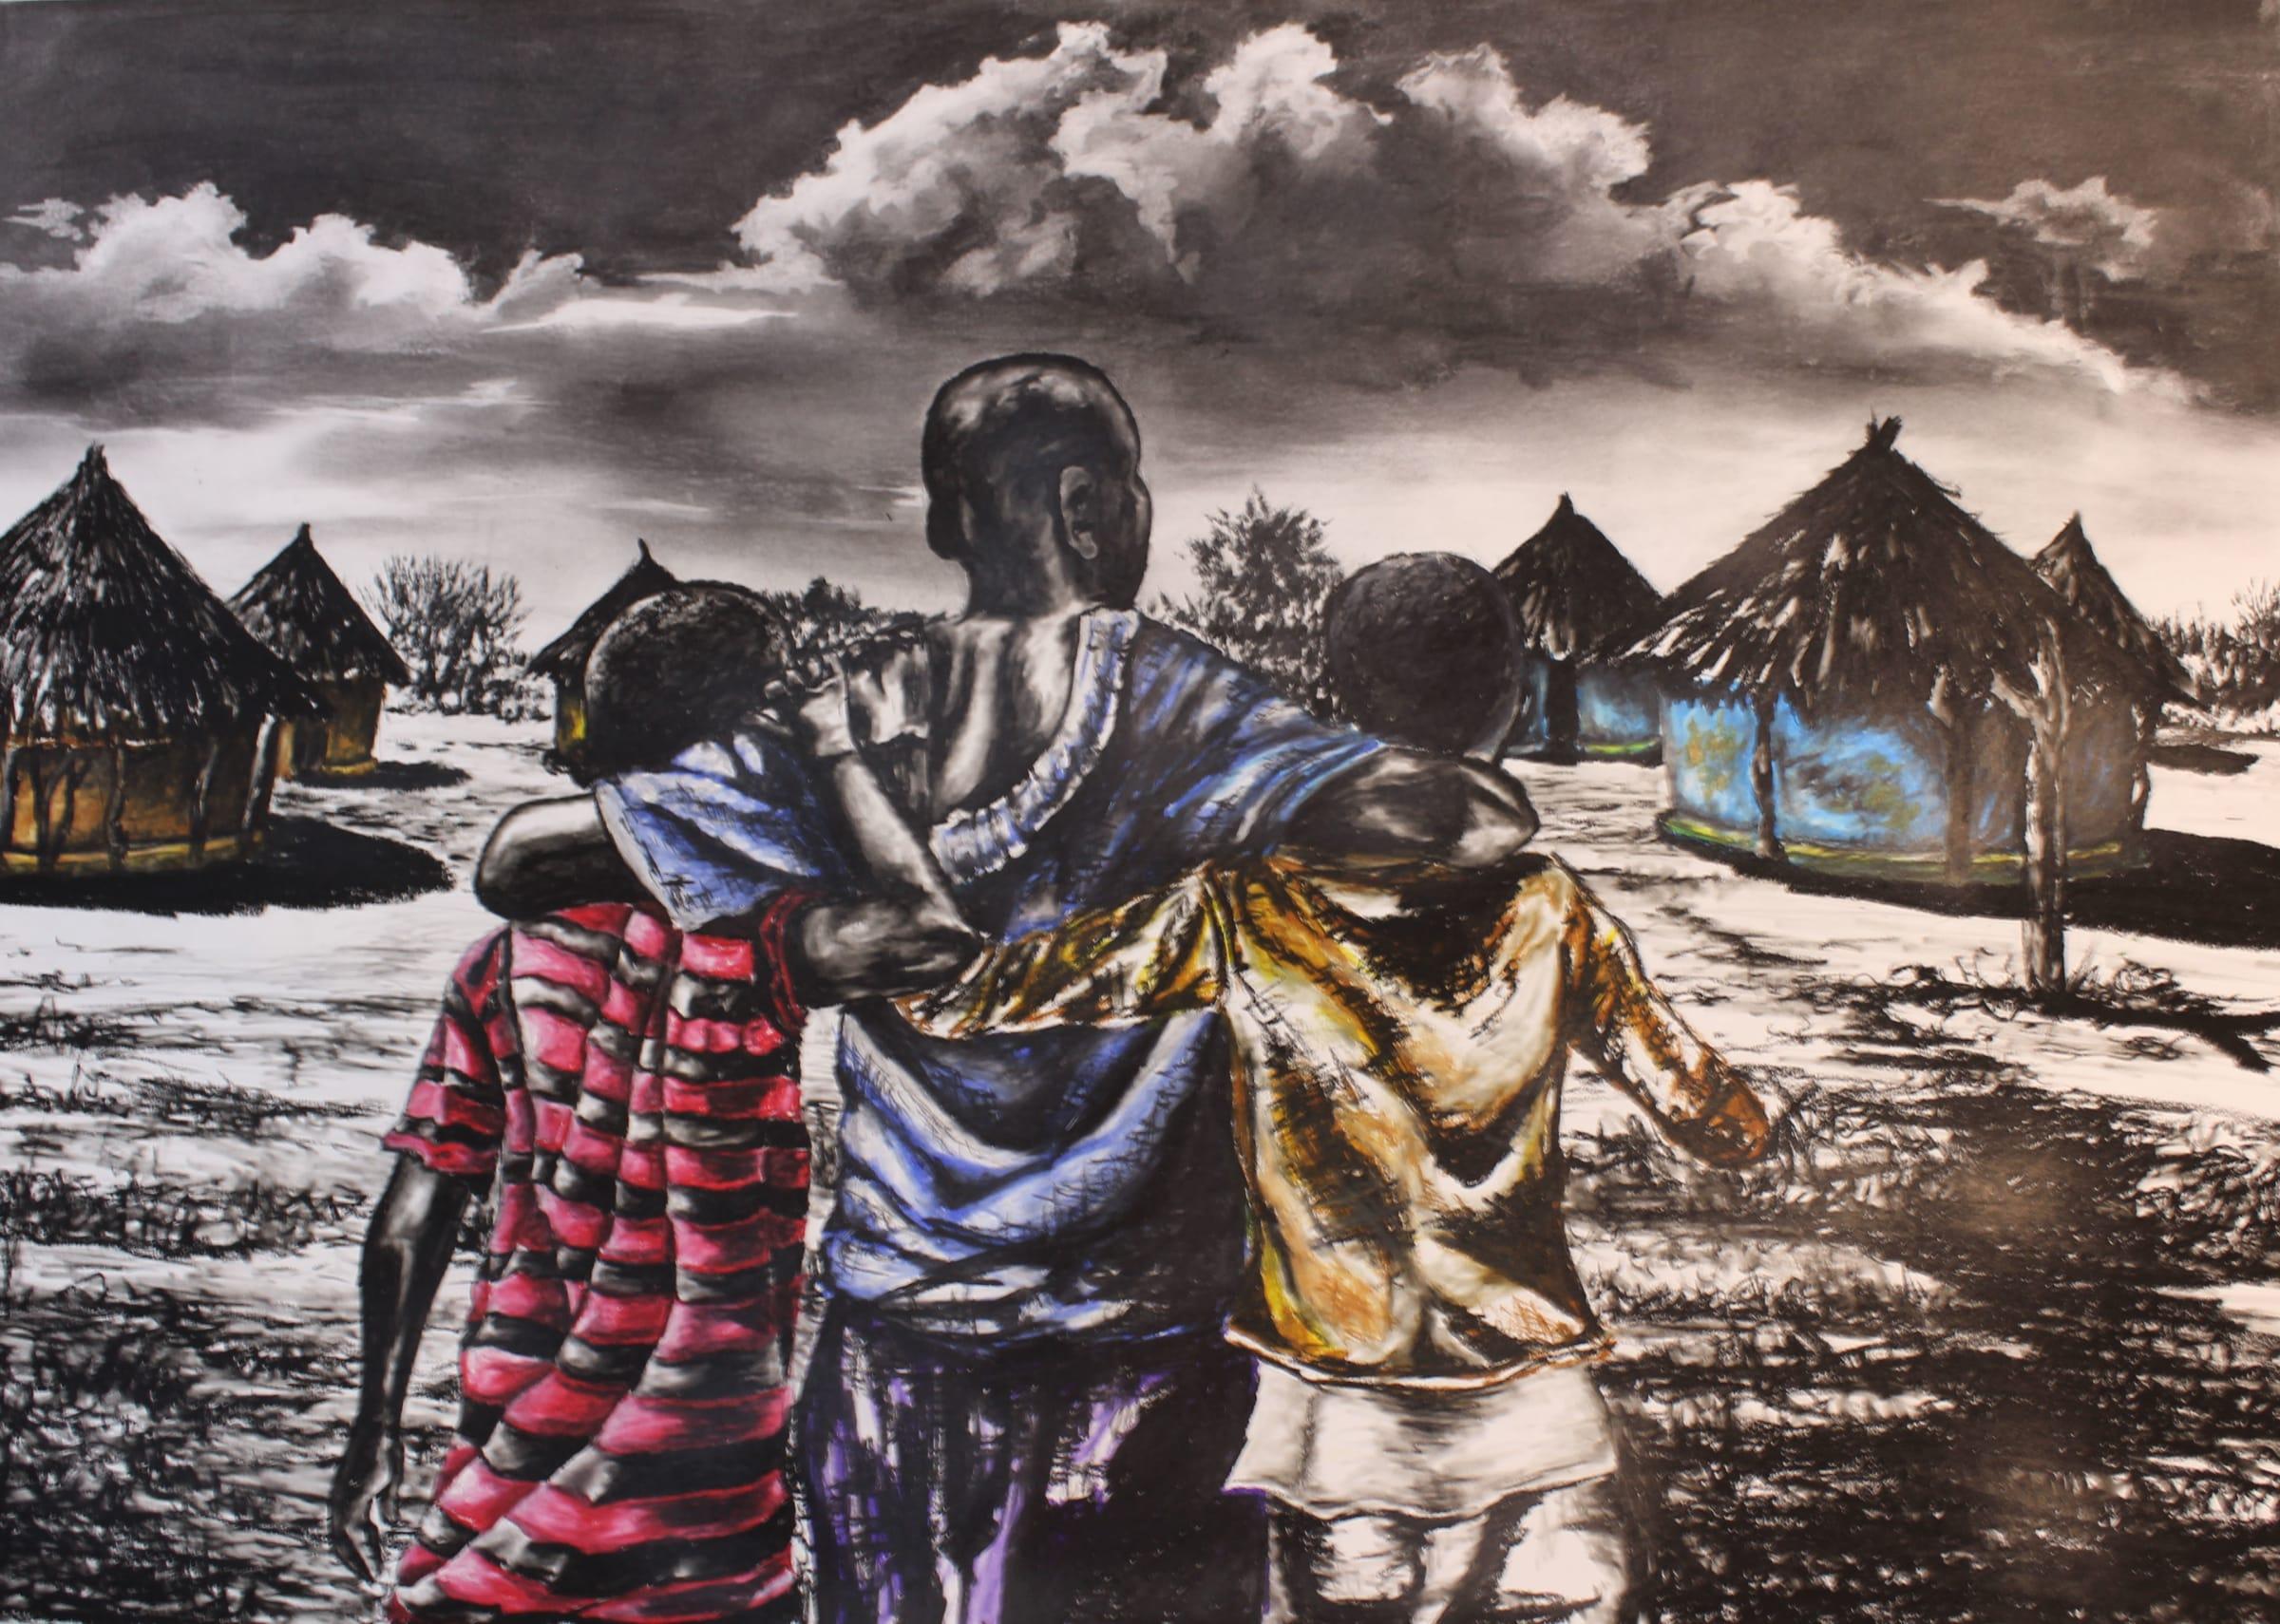 <span class=&#34;link fancybox-details-link&#34;><a href=&#34;/artists/98-walter-fumani-maluleke/works/1570-walter-fumani-maluleke-unity-start-at-home-ntwanano-wu-sanyula-kaya-2018/&#34;>View Detail Page</a></span><div class=&#34;artist&#34;><strong>Walter Fumani Maluleke</strong></div> <div class=&#34;title&#34;><em>Unity Start At Home (Ntwanano Wu Sanyula Kaya)</em>, 2018</div> <div class=&#34;medium&#34;>Charcoal & Pastels On Fabriano</div> <div class=&#34;dimensions&#34;>118.5cm x 84.5cm (137cm x 102.5cm framed)</div>